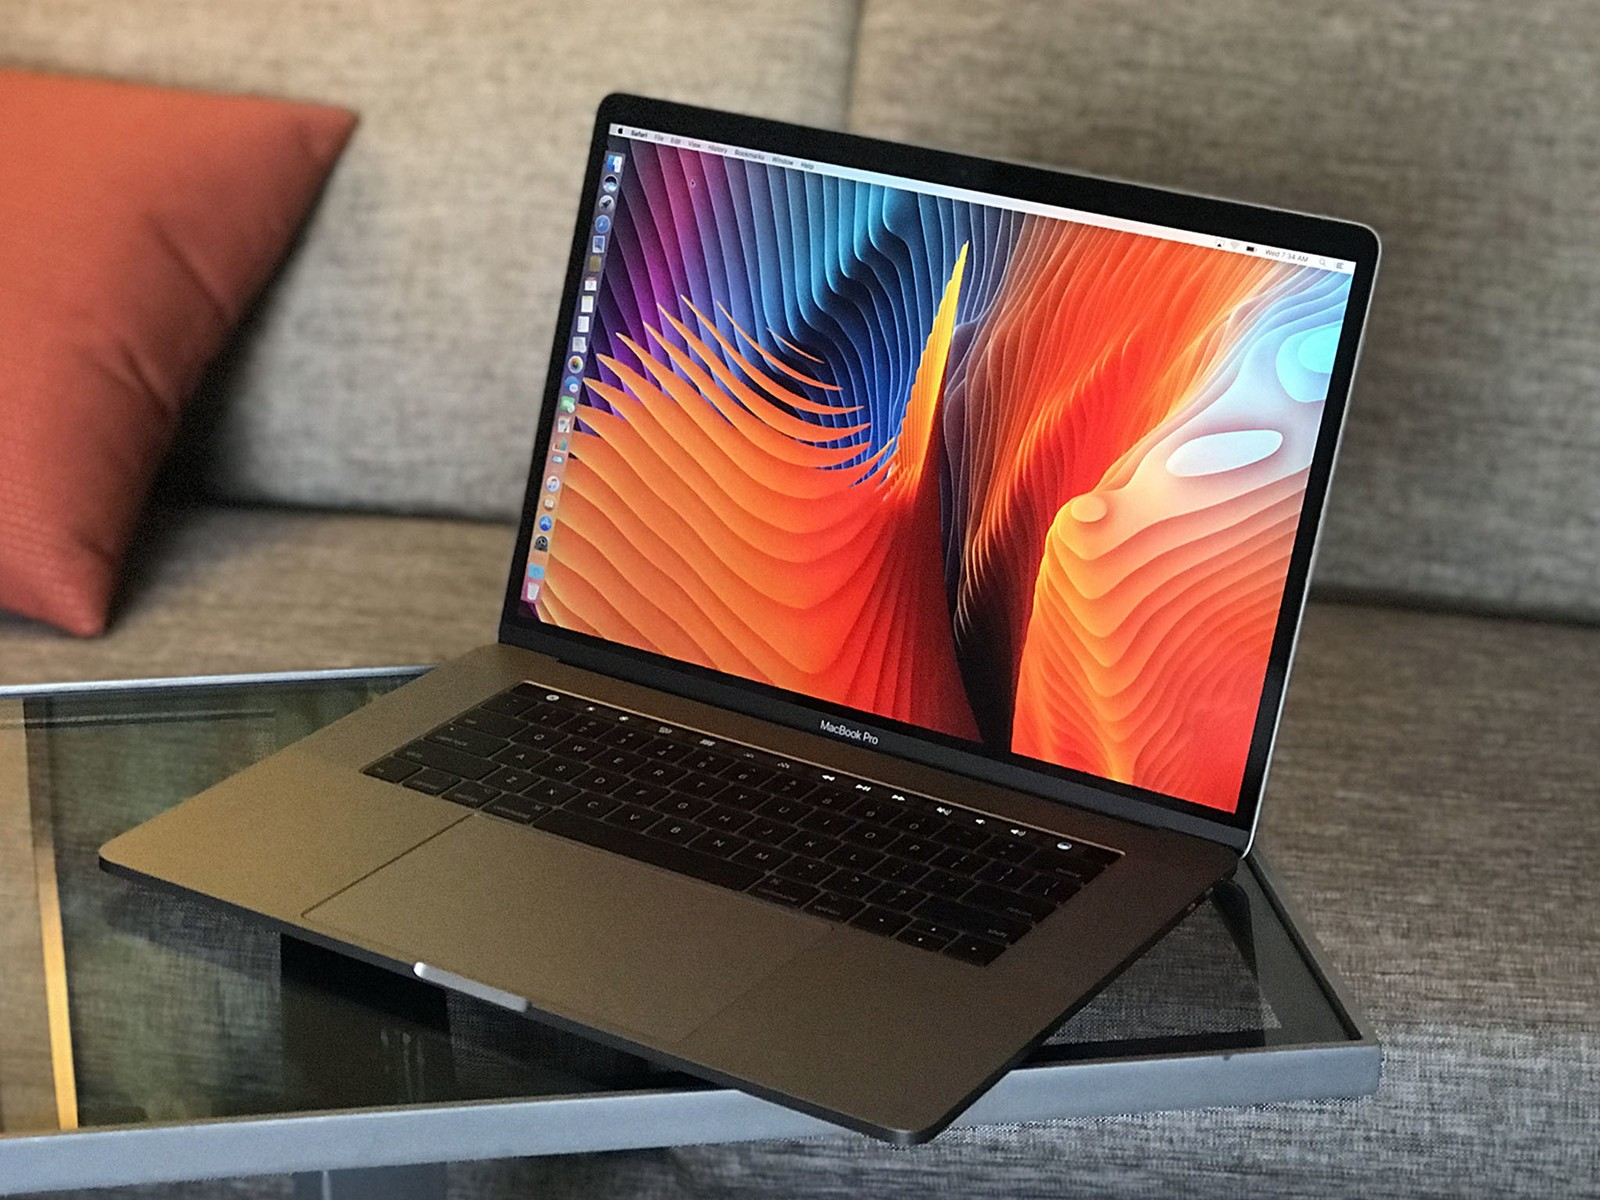 Macbook Pro 13 2018 And Pro 15 2018 Latest Quad Core Improvements